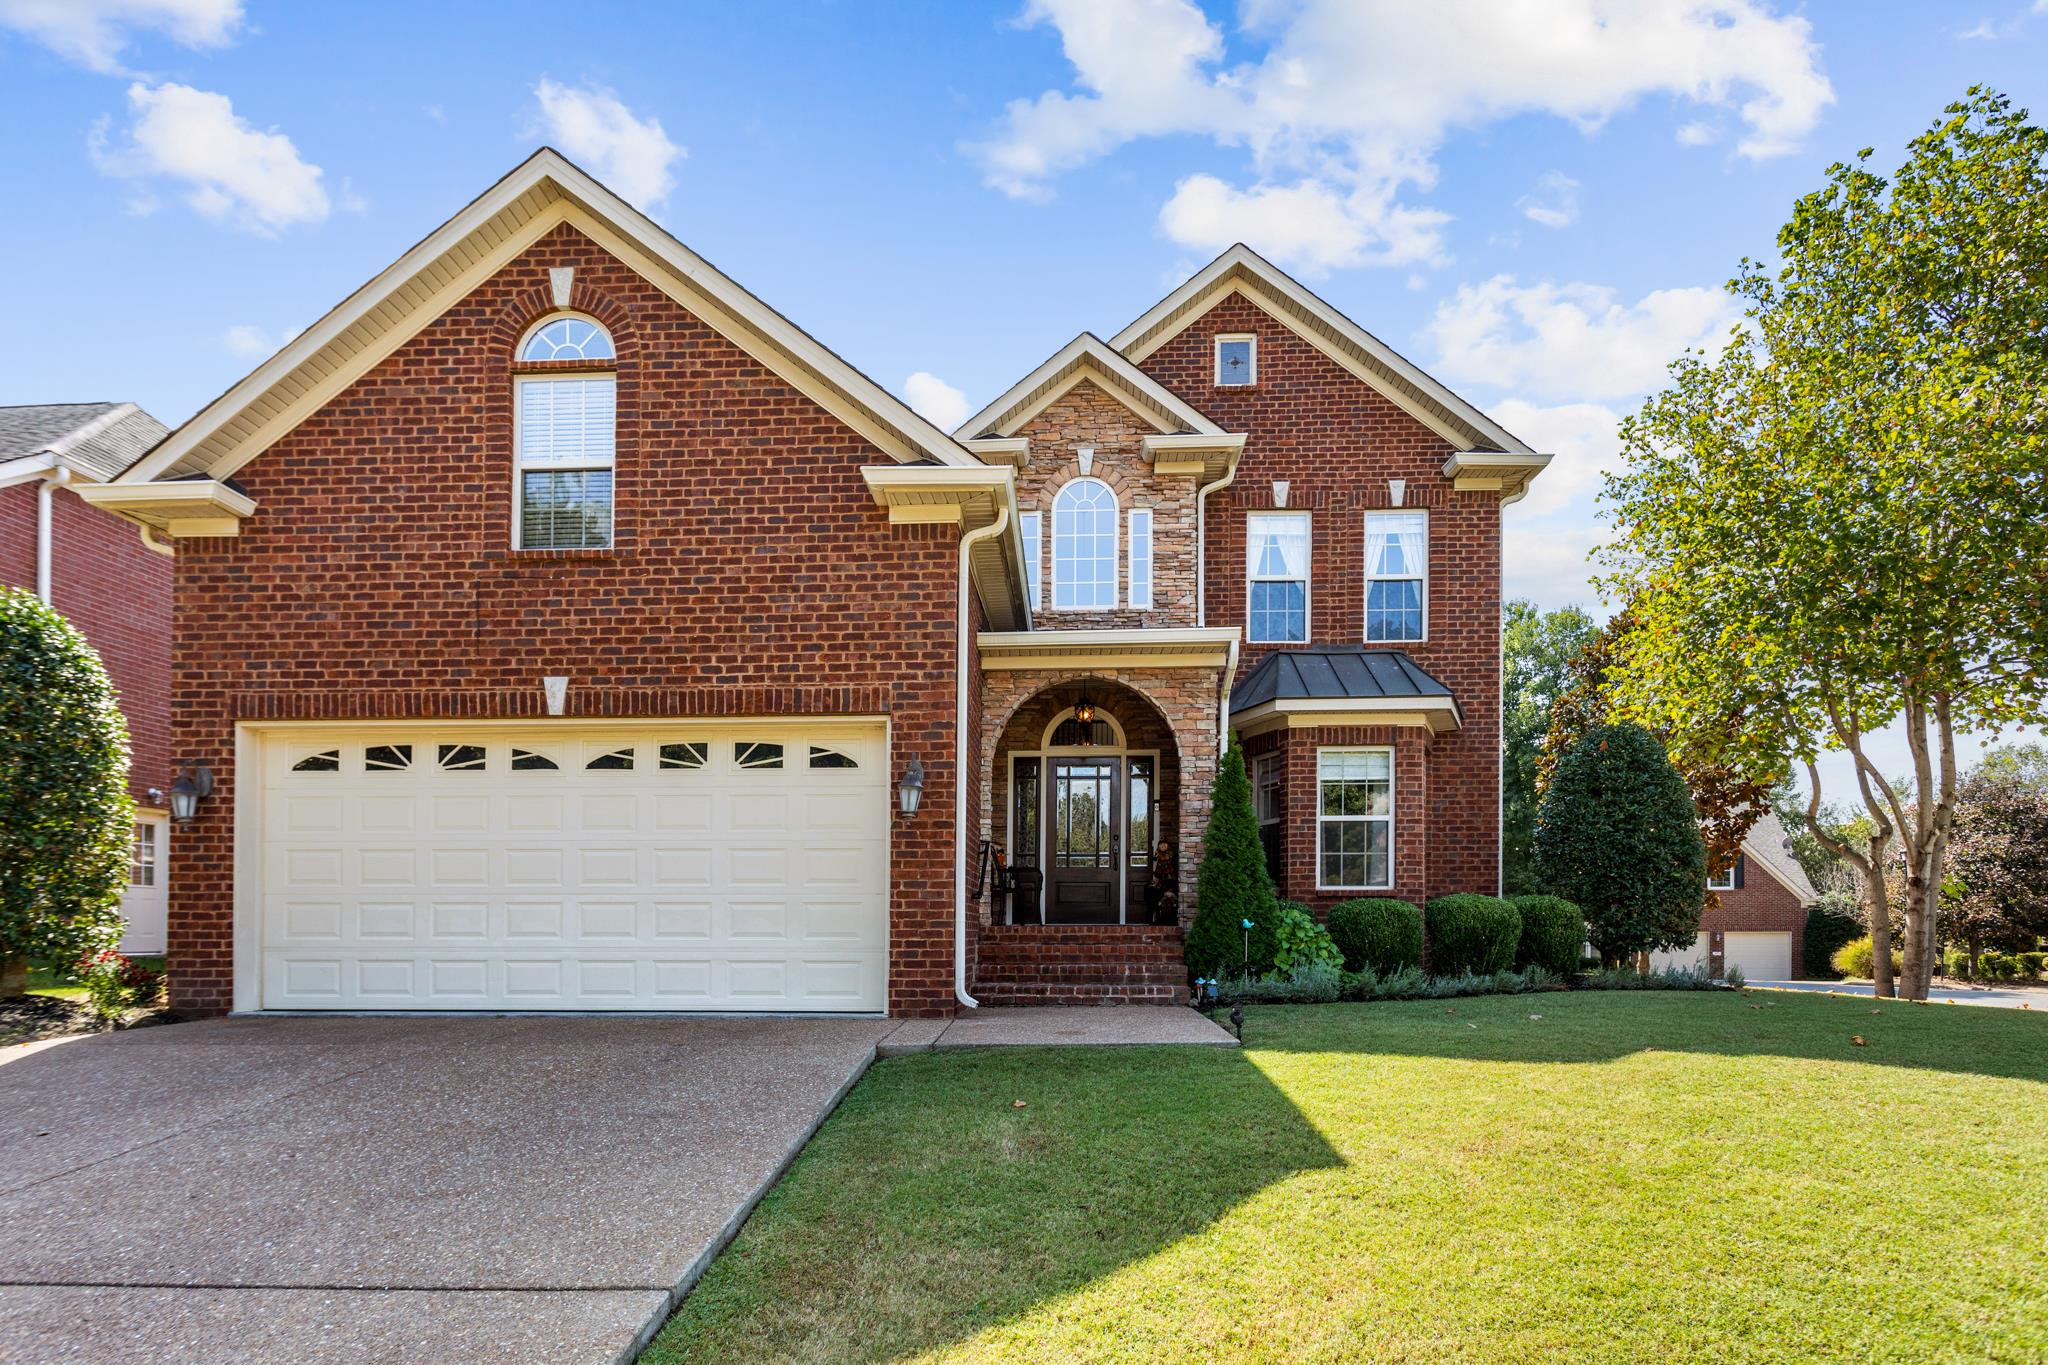 4829 Redcastle Rdg, Nashville, TN 37211 - Nashville, TN real estate listing